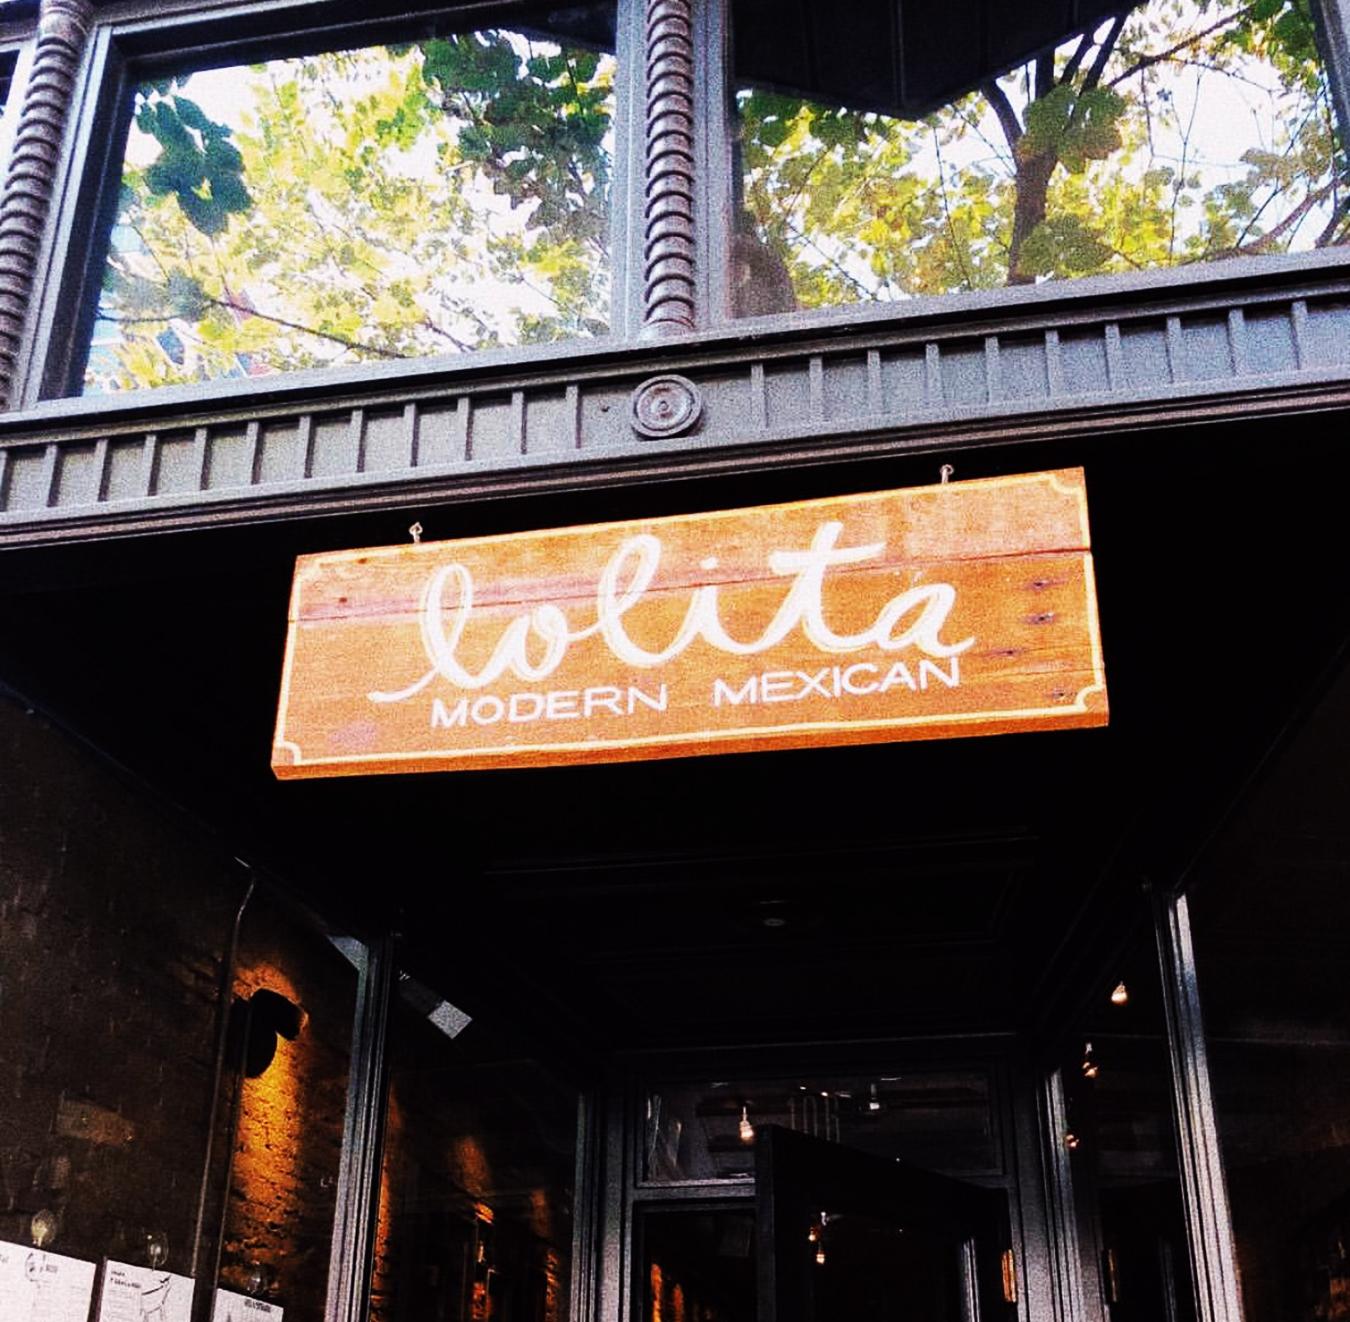 Lolita_Modern_Mexican_gayborhood_philadelphia_food_Katie_Kerl_